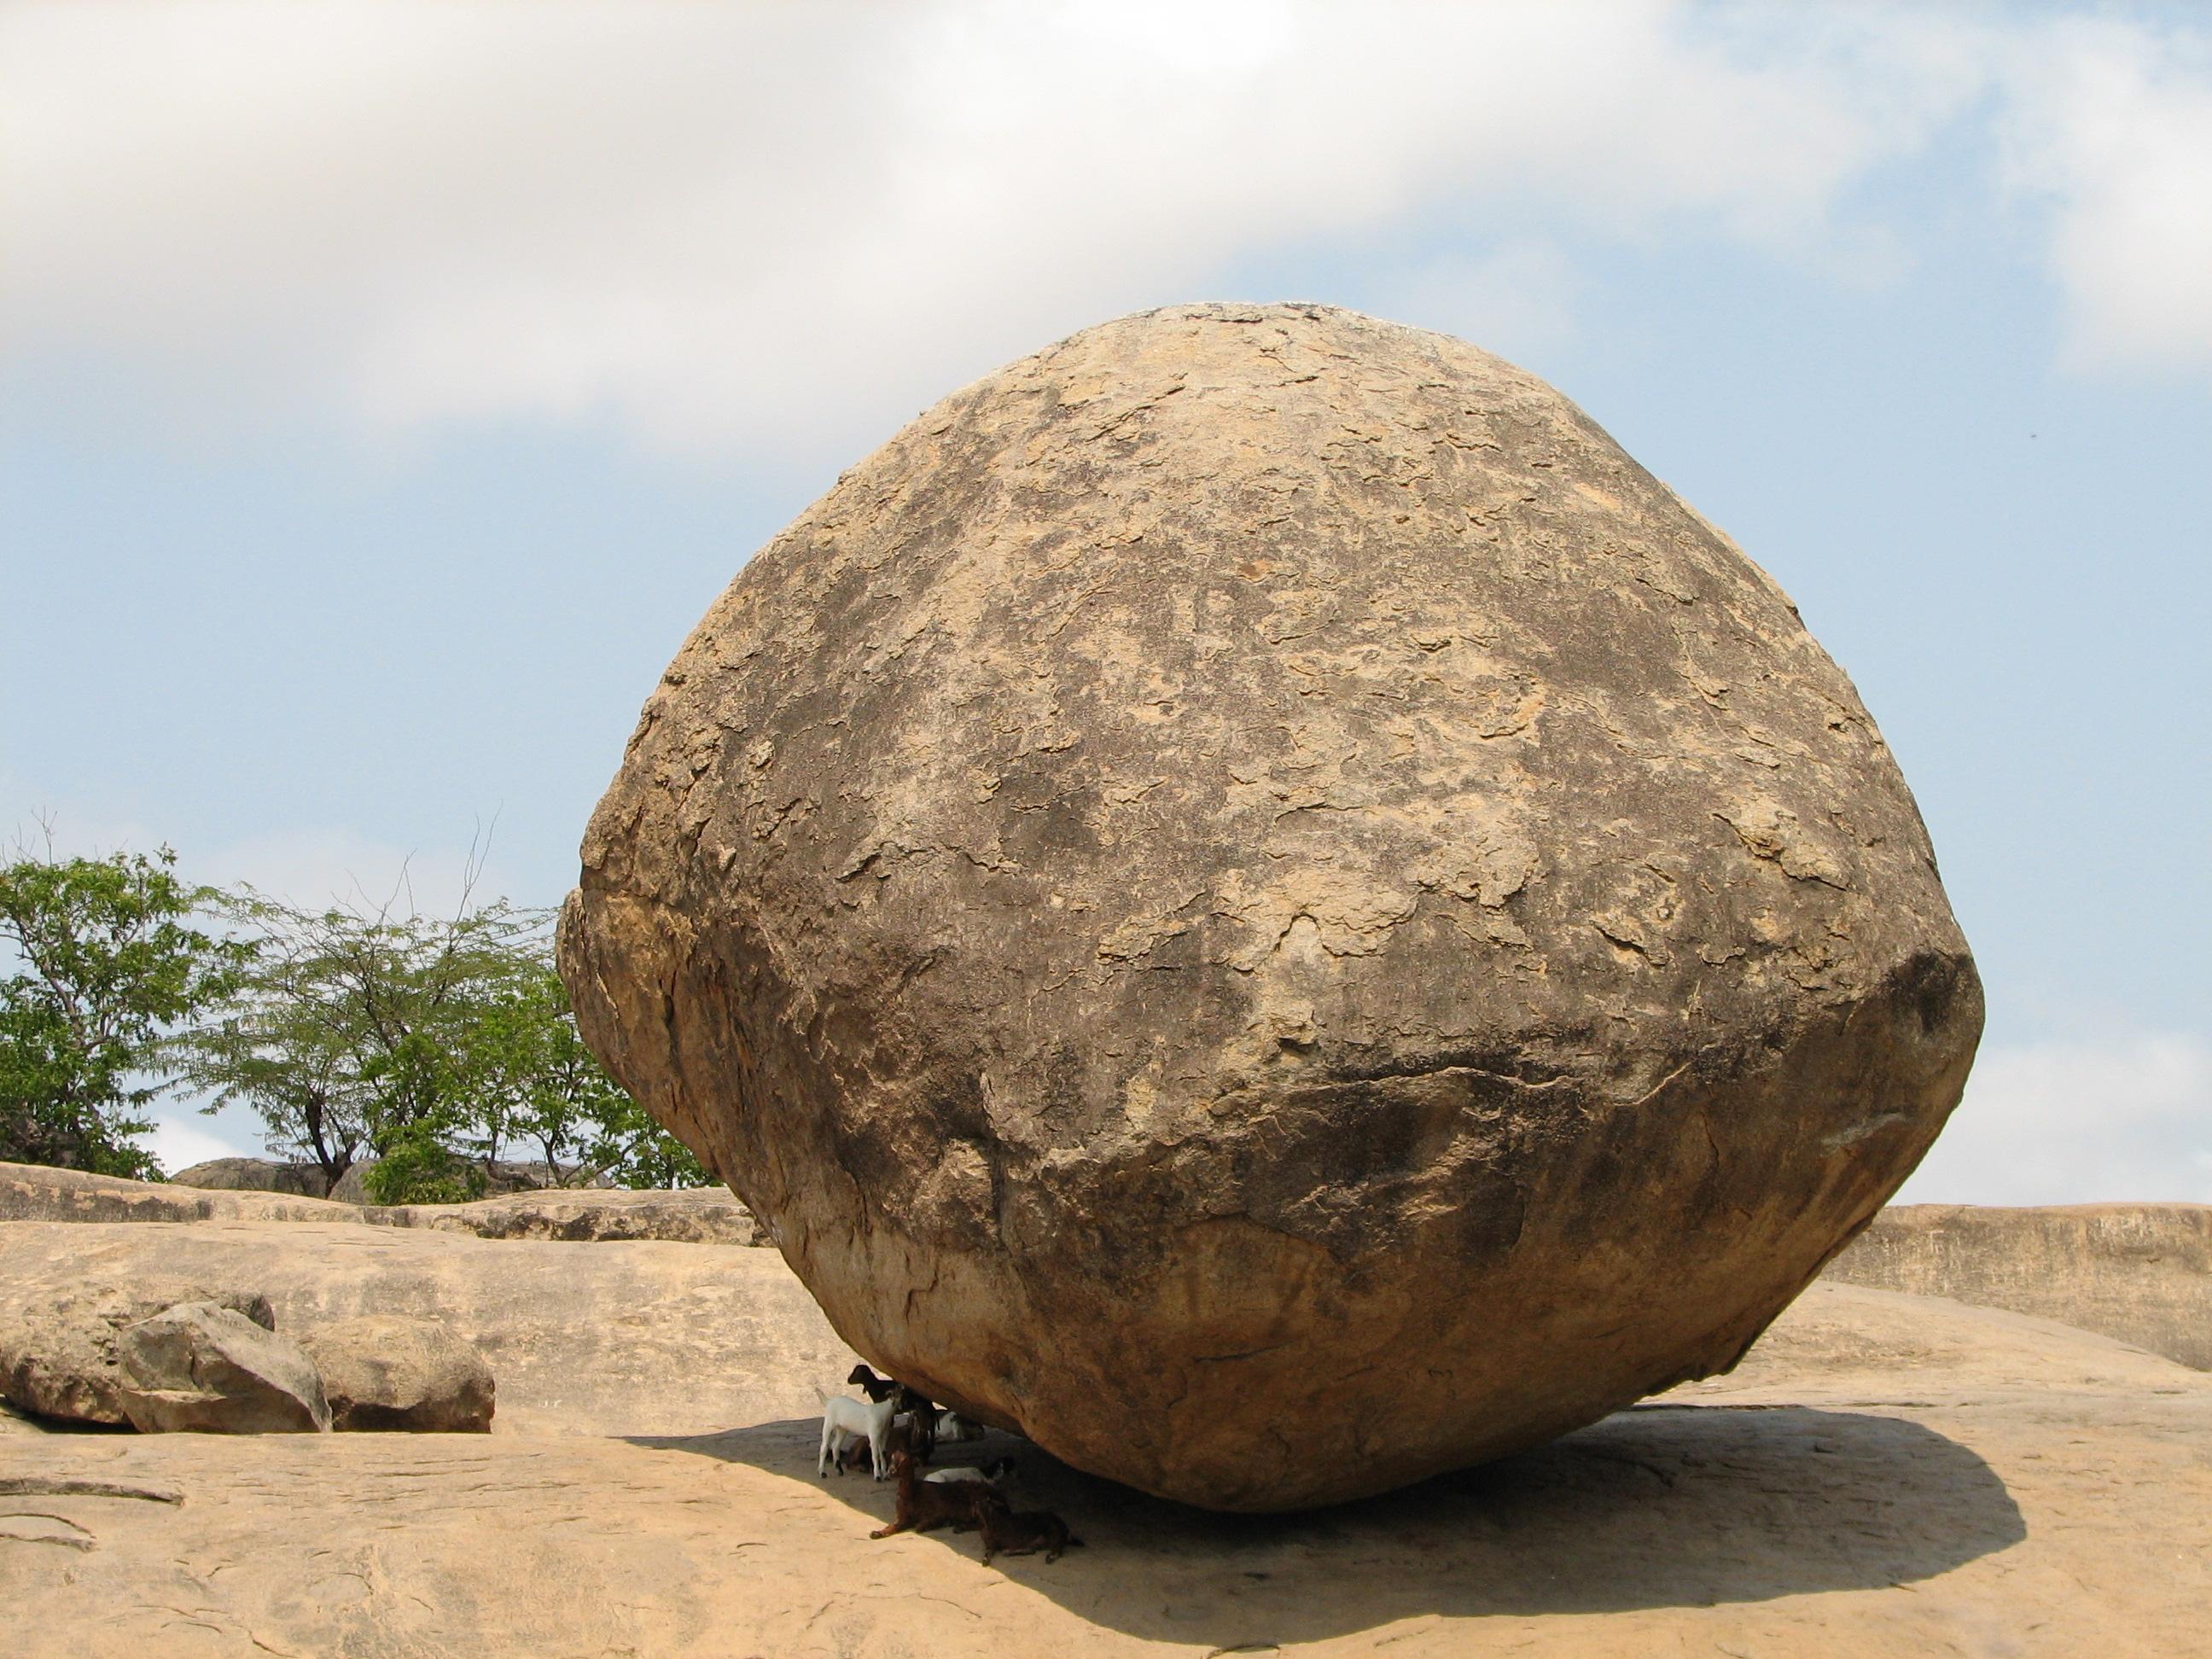 krishna-butter-ball-made-of-makkhan-by-lord-krishna